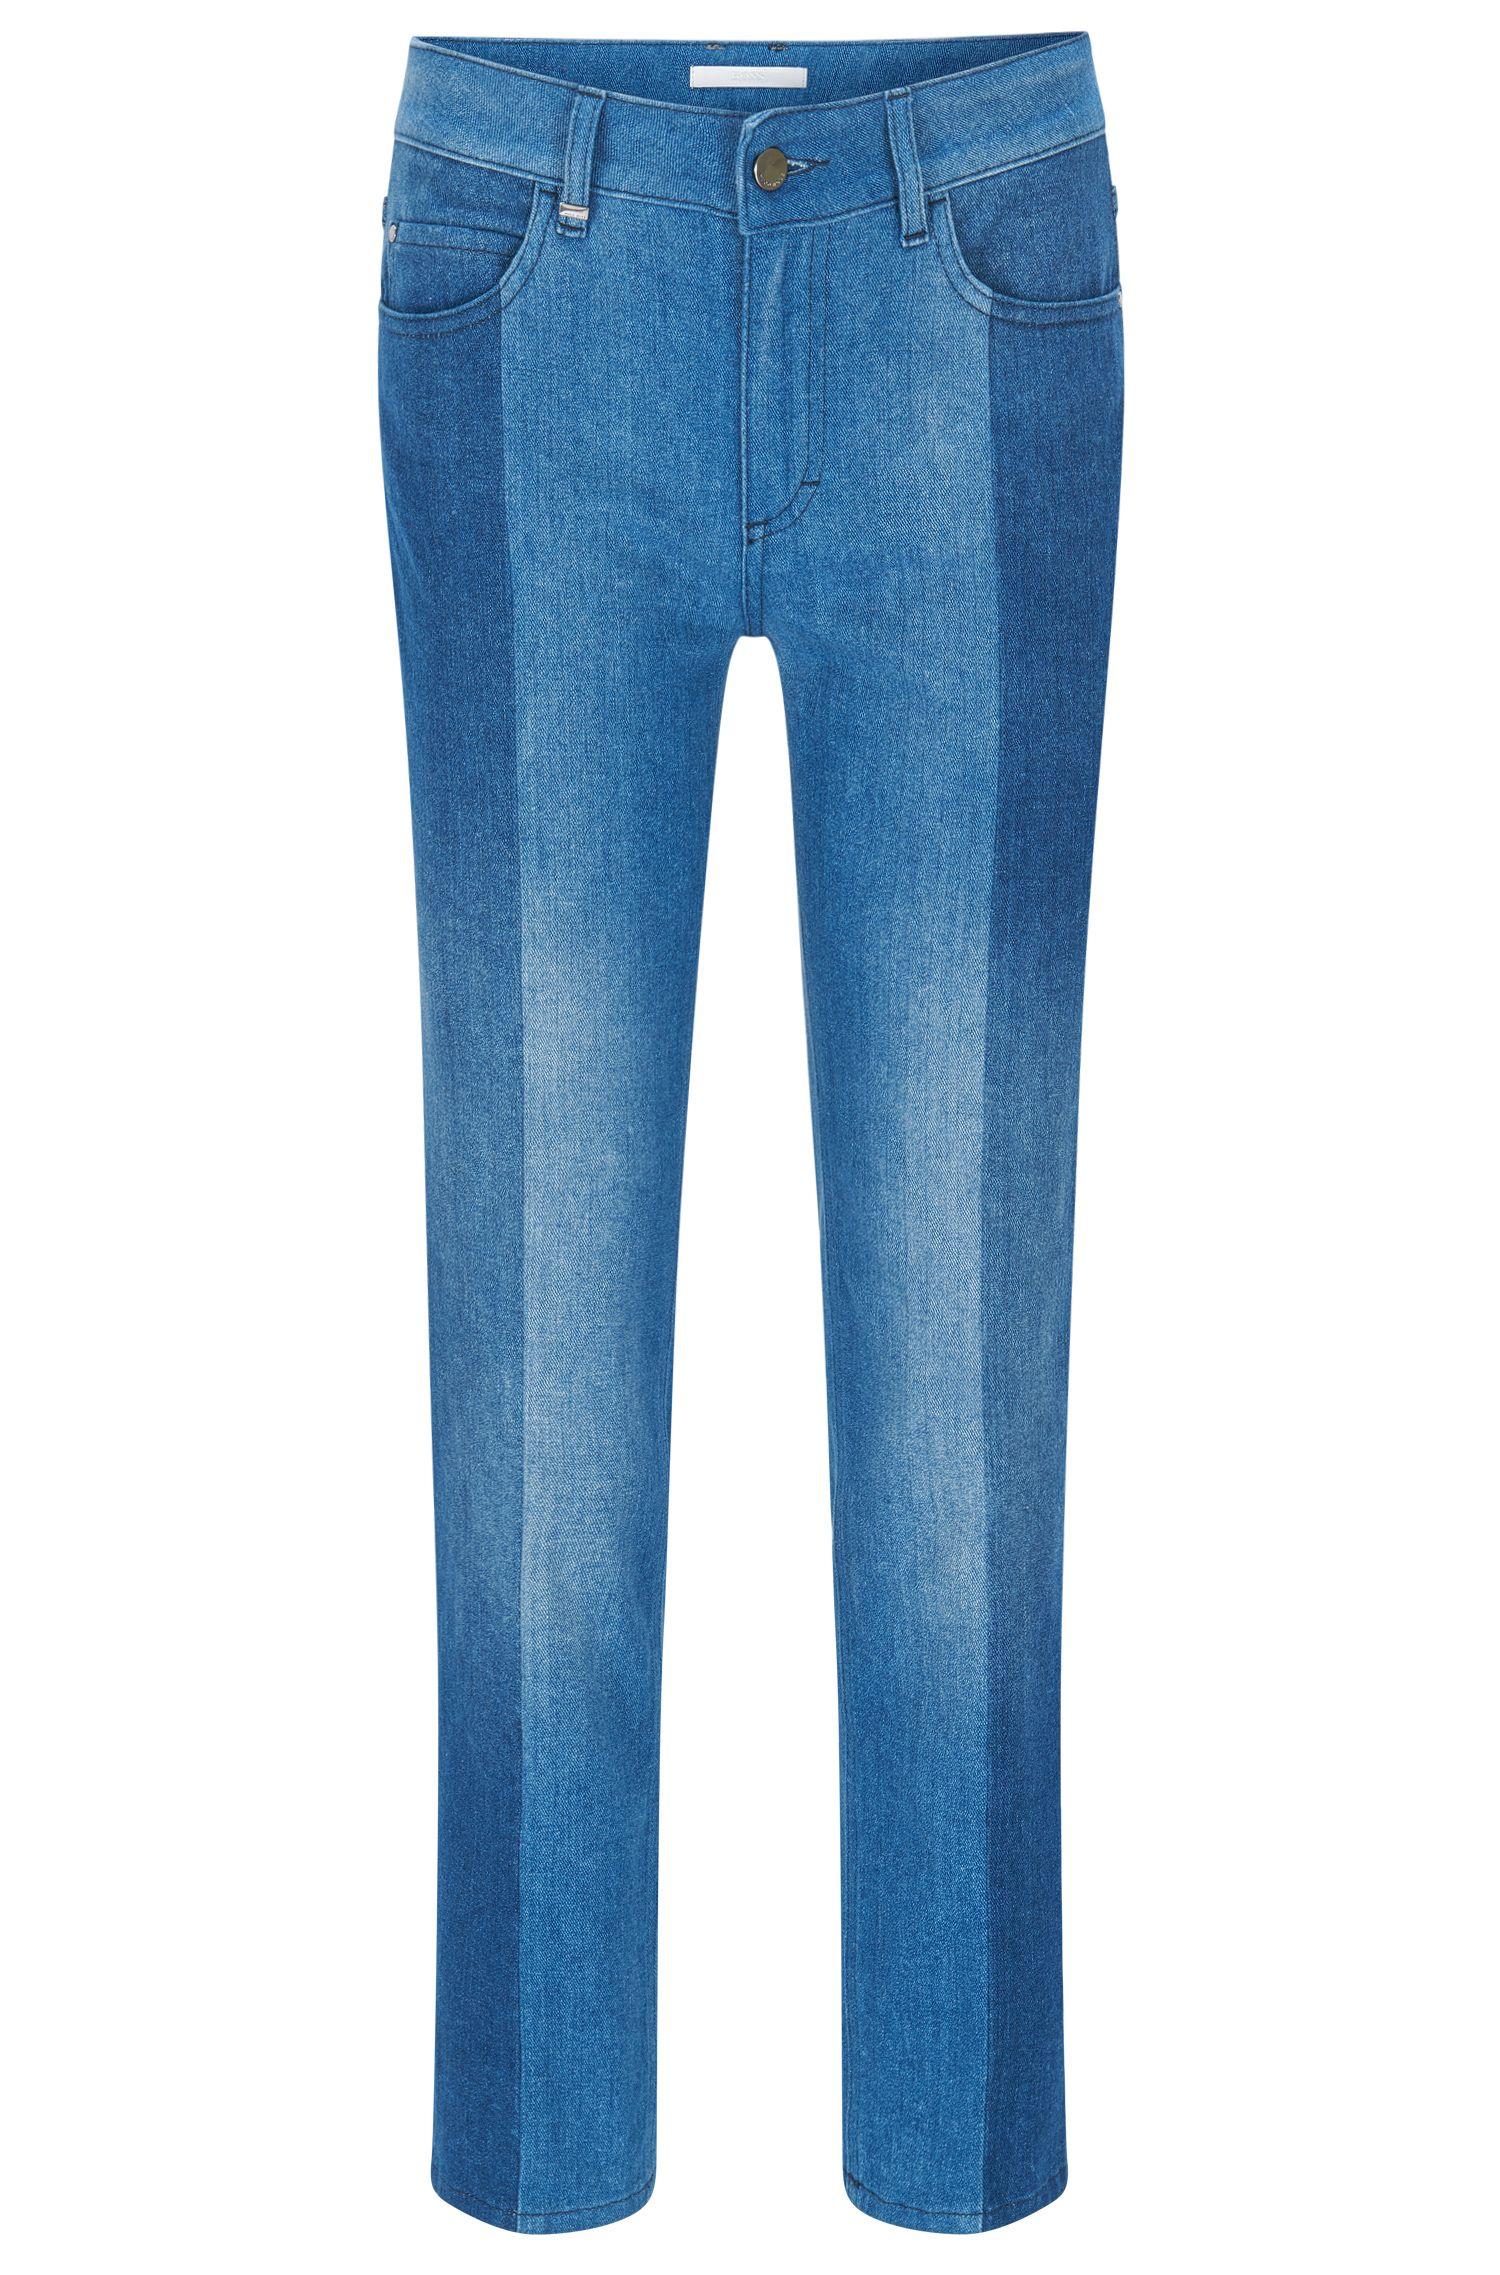 Relaxed-Fit Jeans aus edlem italienischem Denim